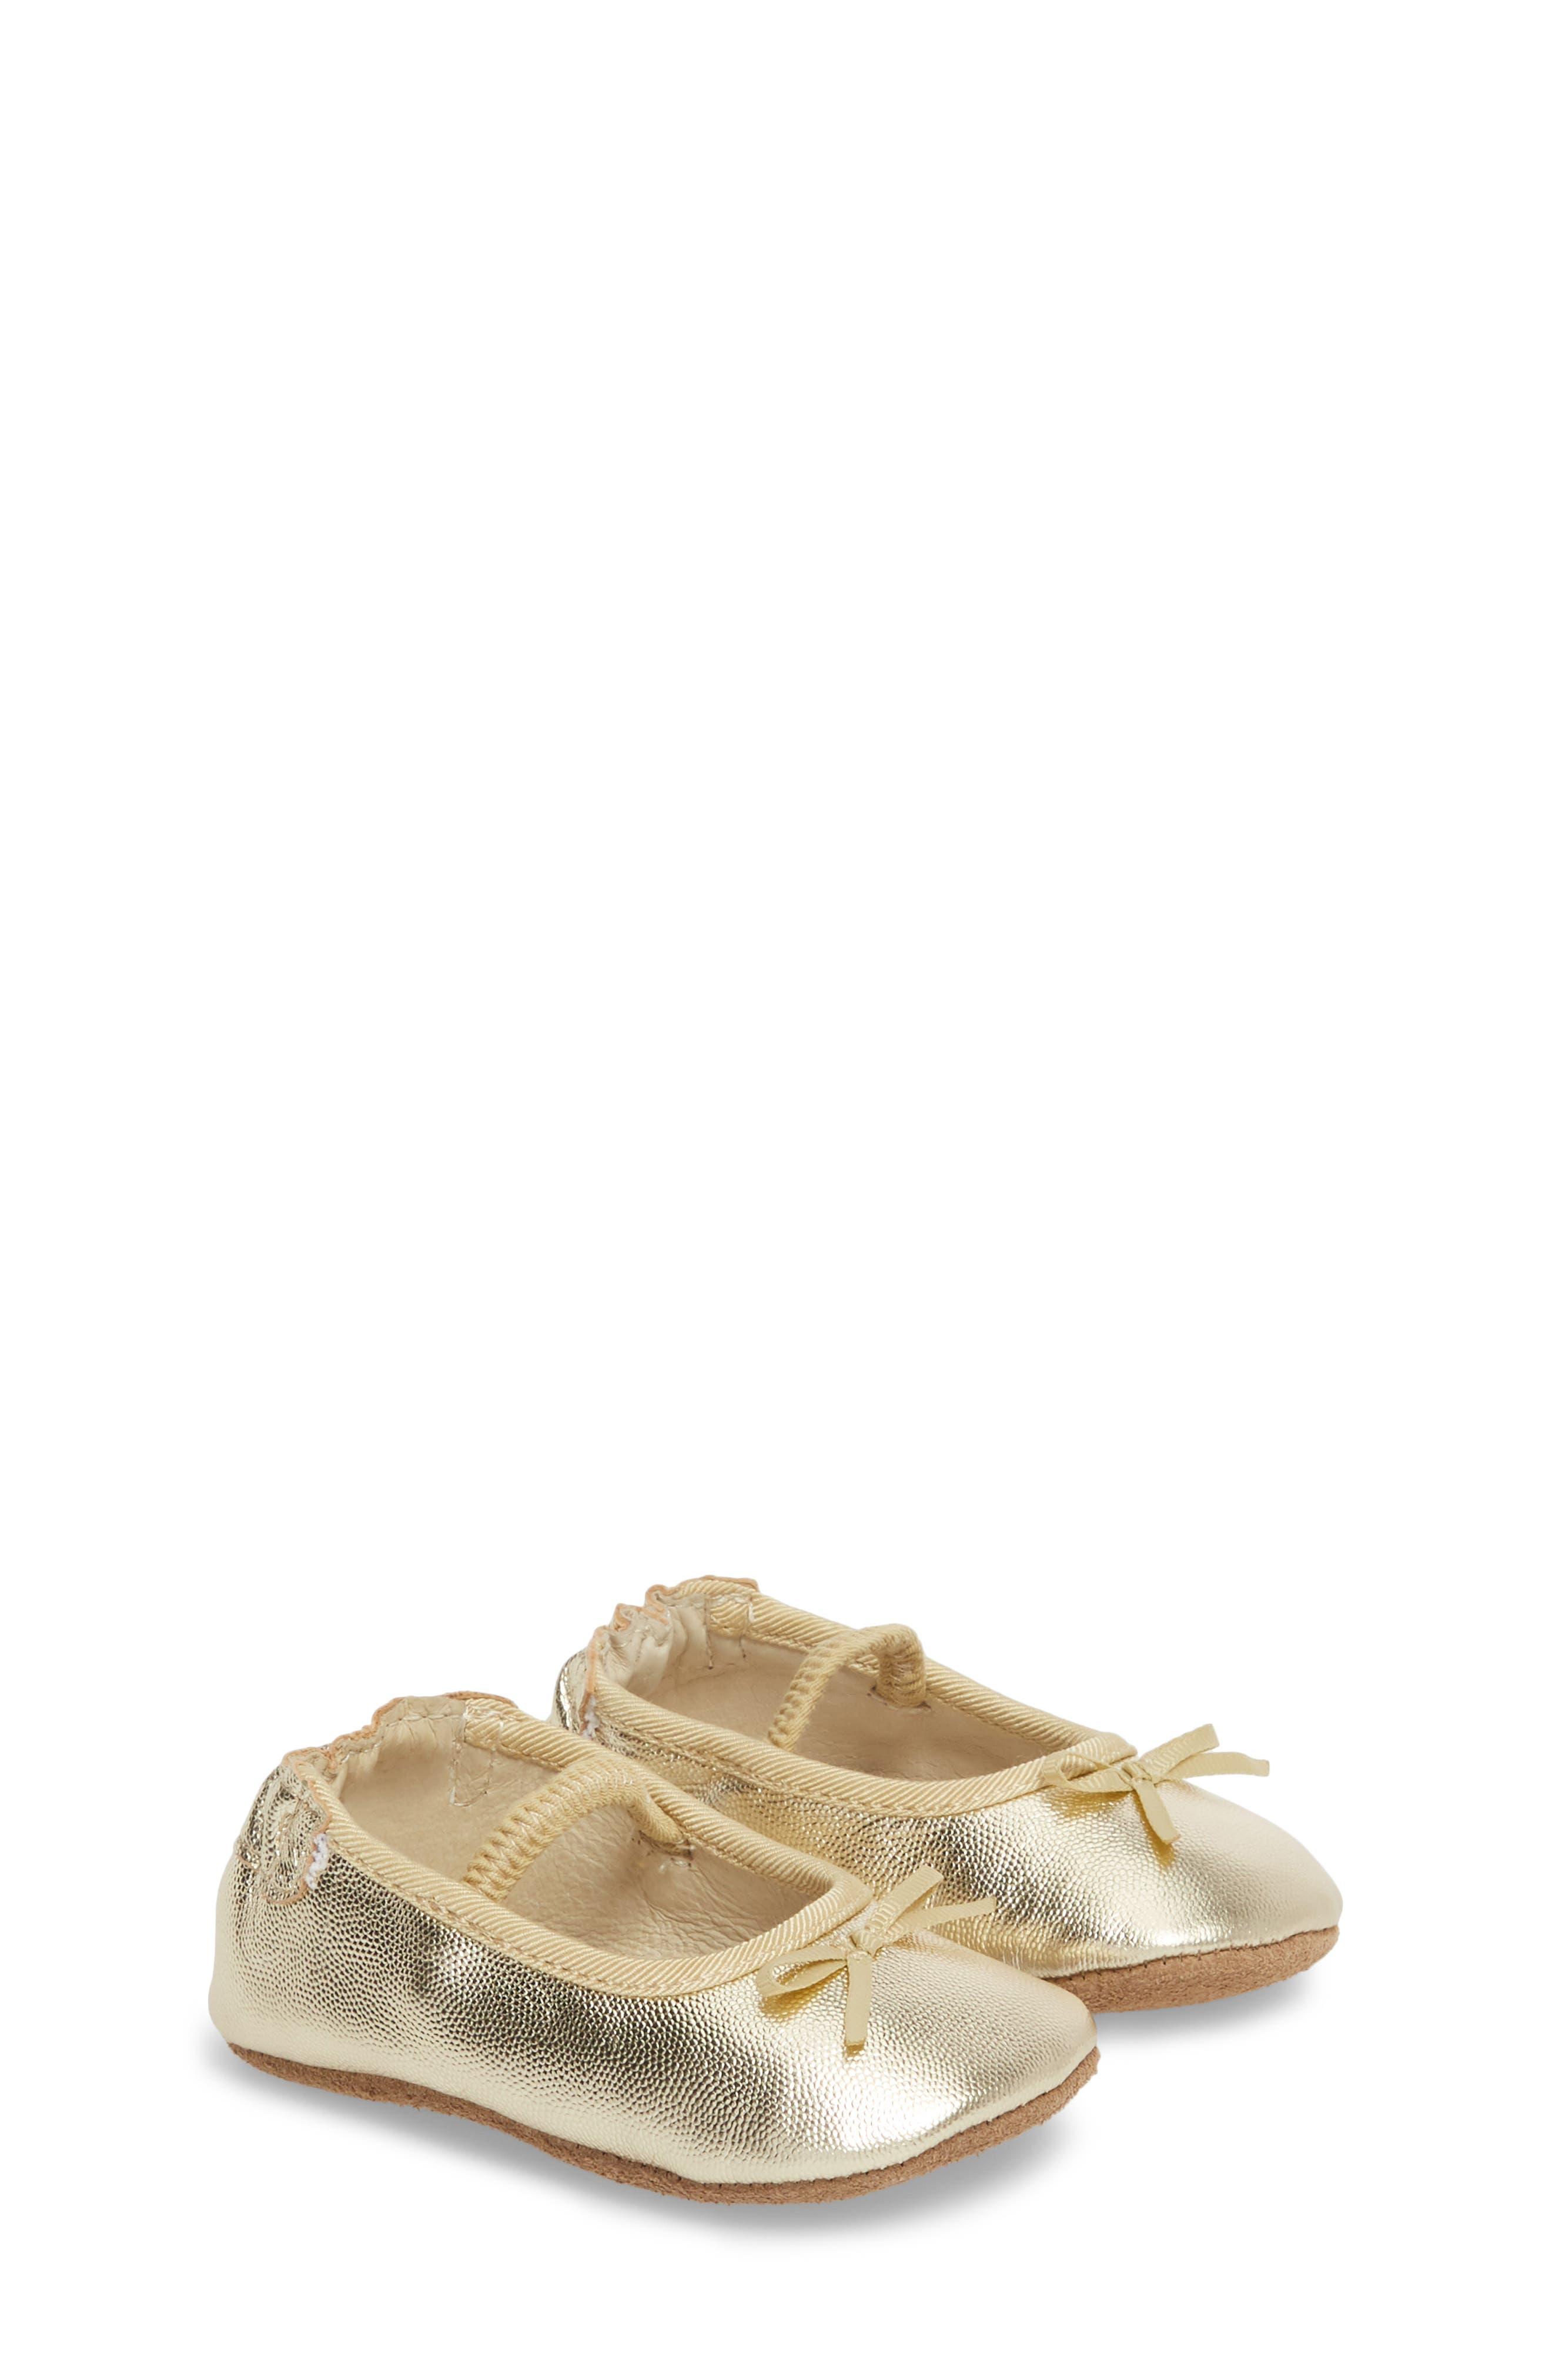 ROBEEZ<SUP>®</SUP> Athena Ballet Strap Crib Shoe, Main, color, GOLD